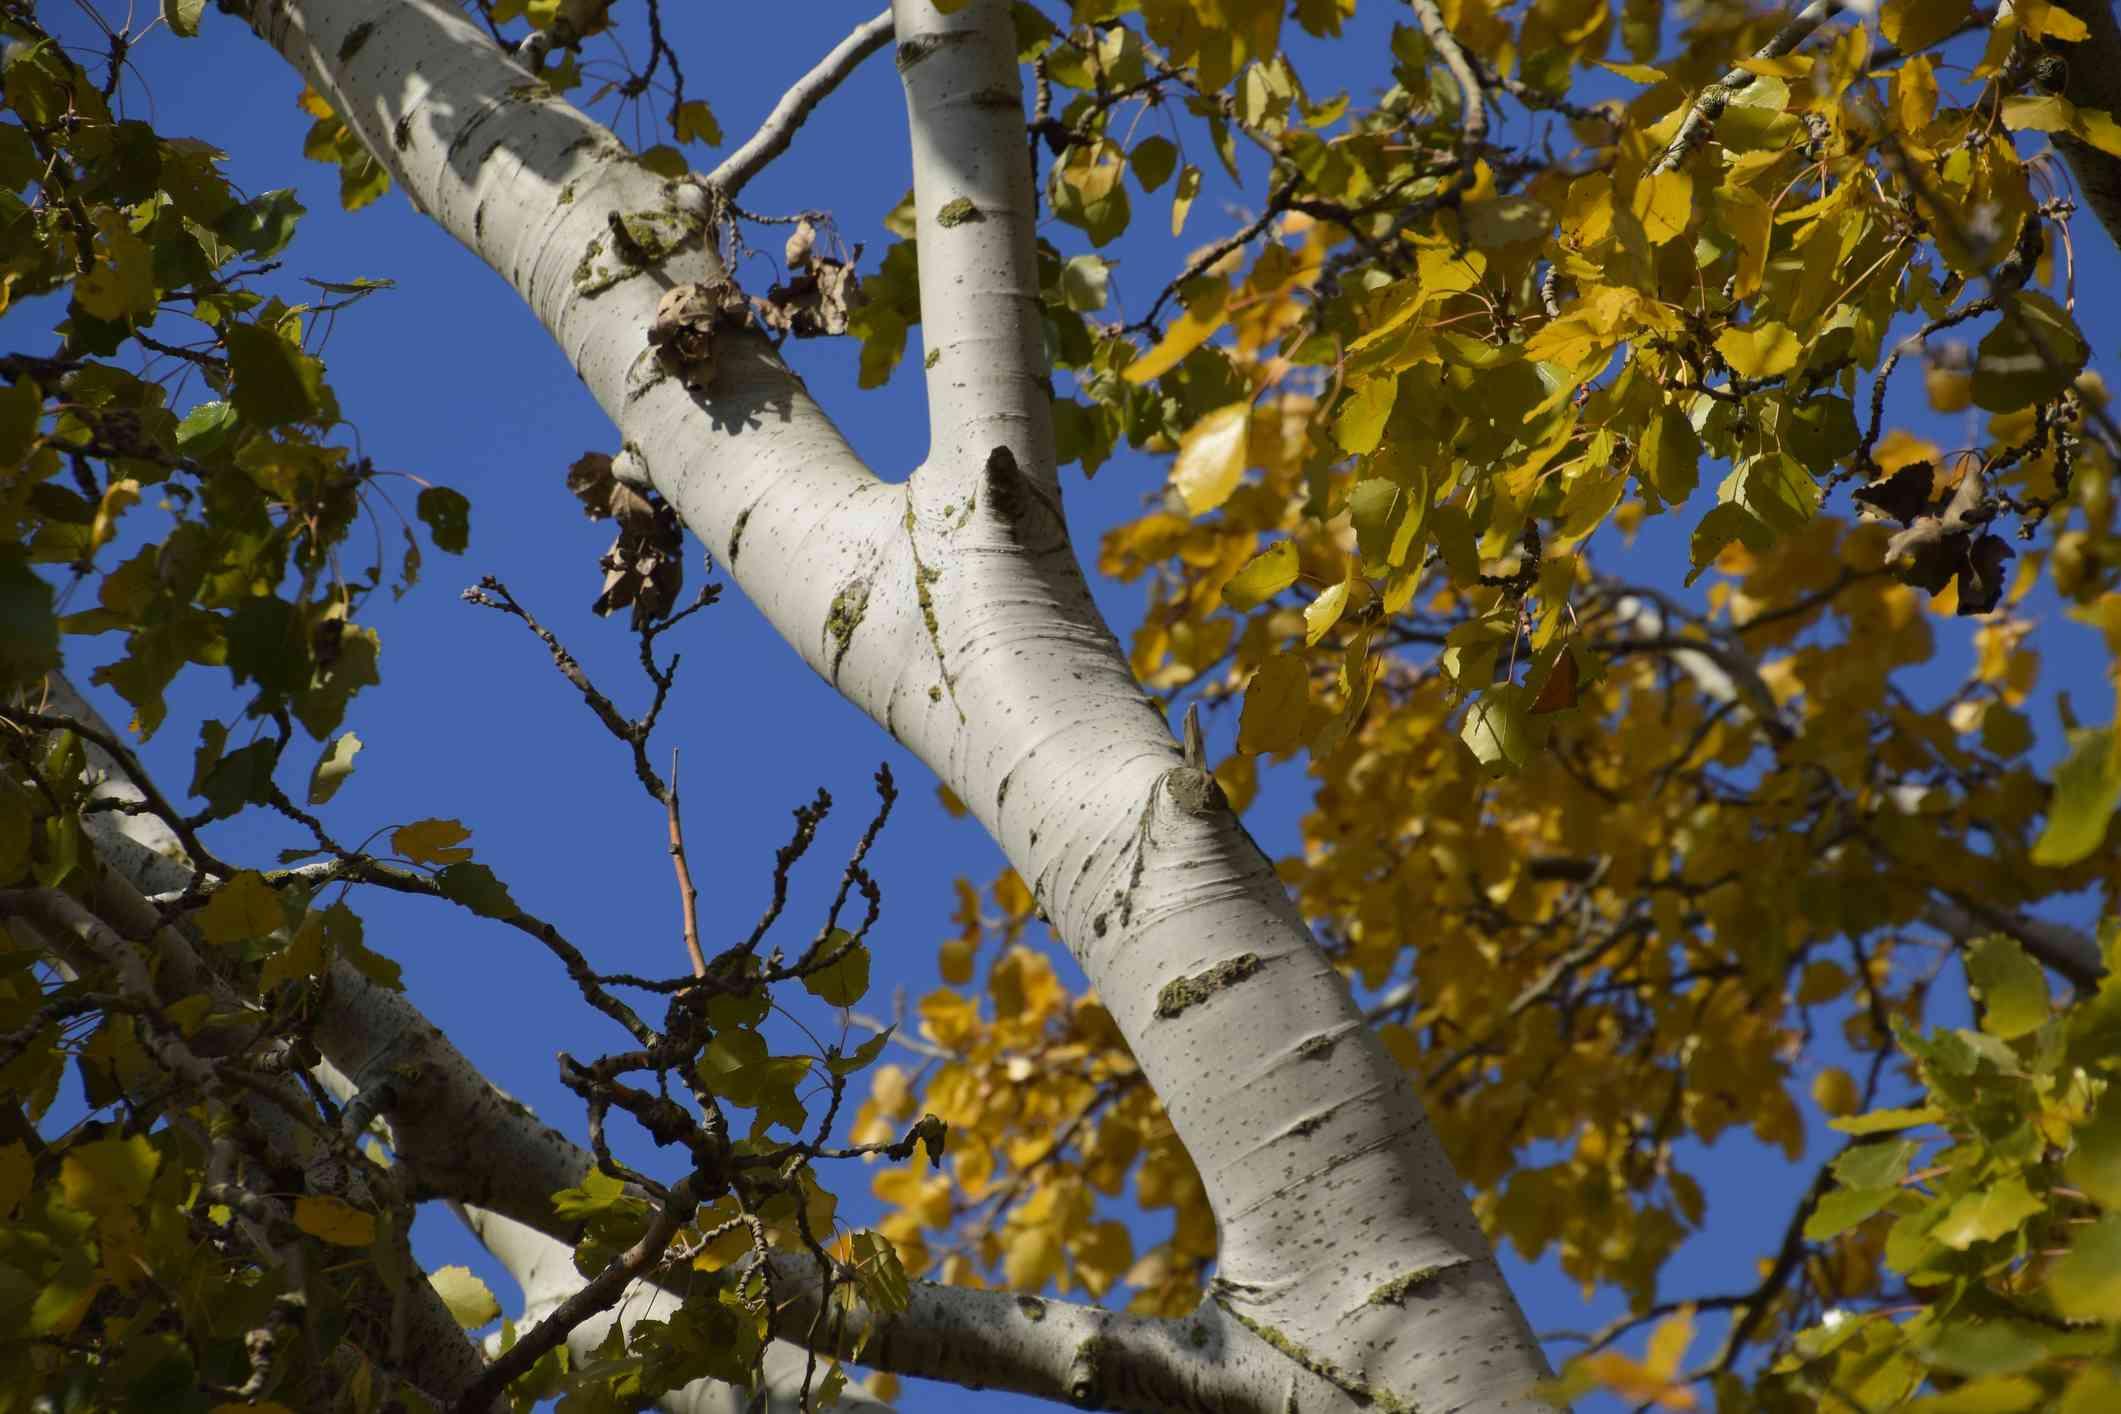 Silver poplar in autumn against the blue sky.